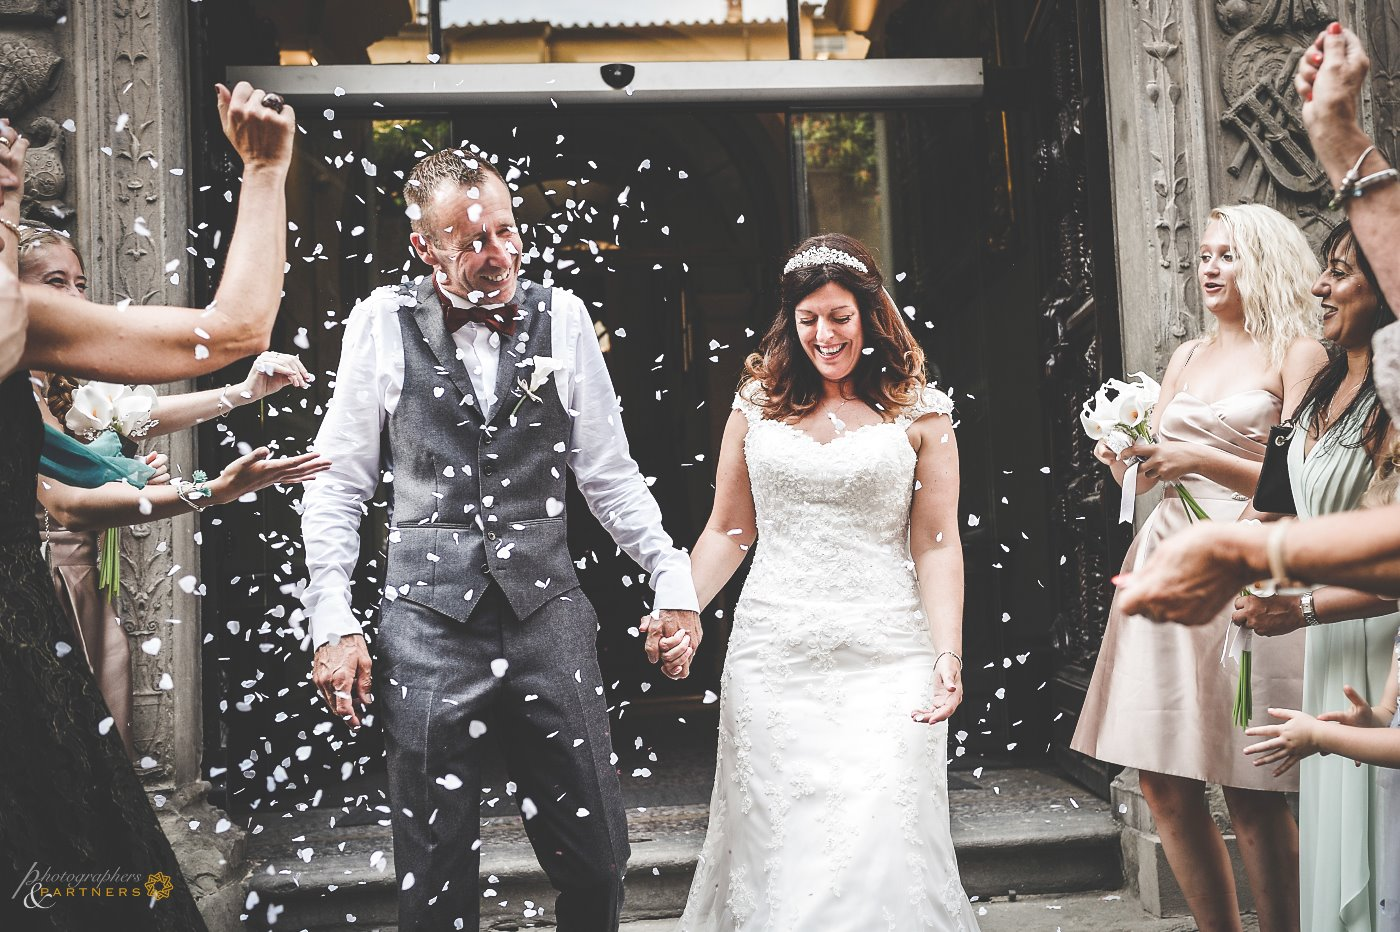 photography_weddings_lucca_09.jpg